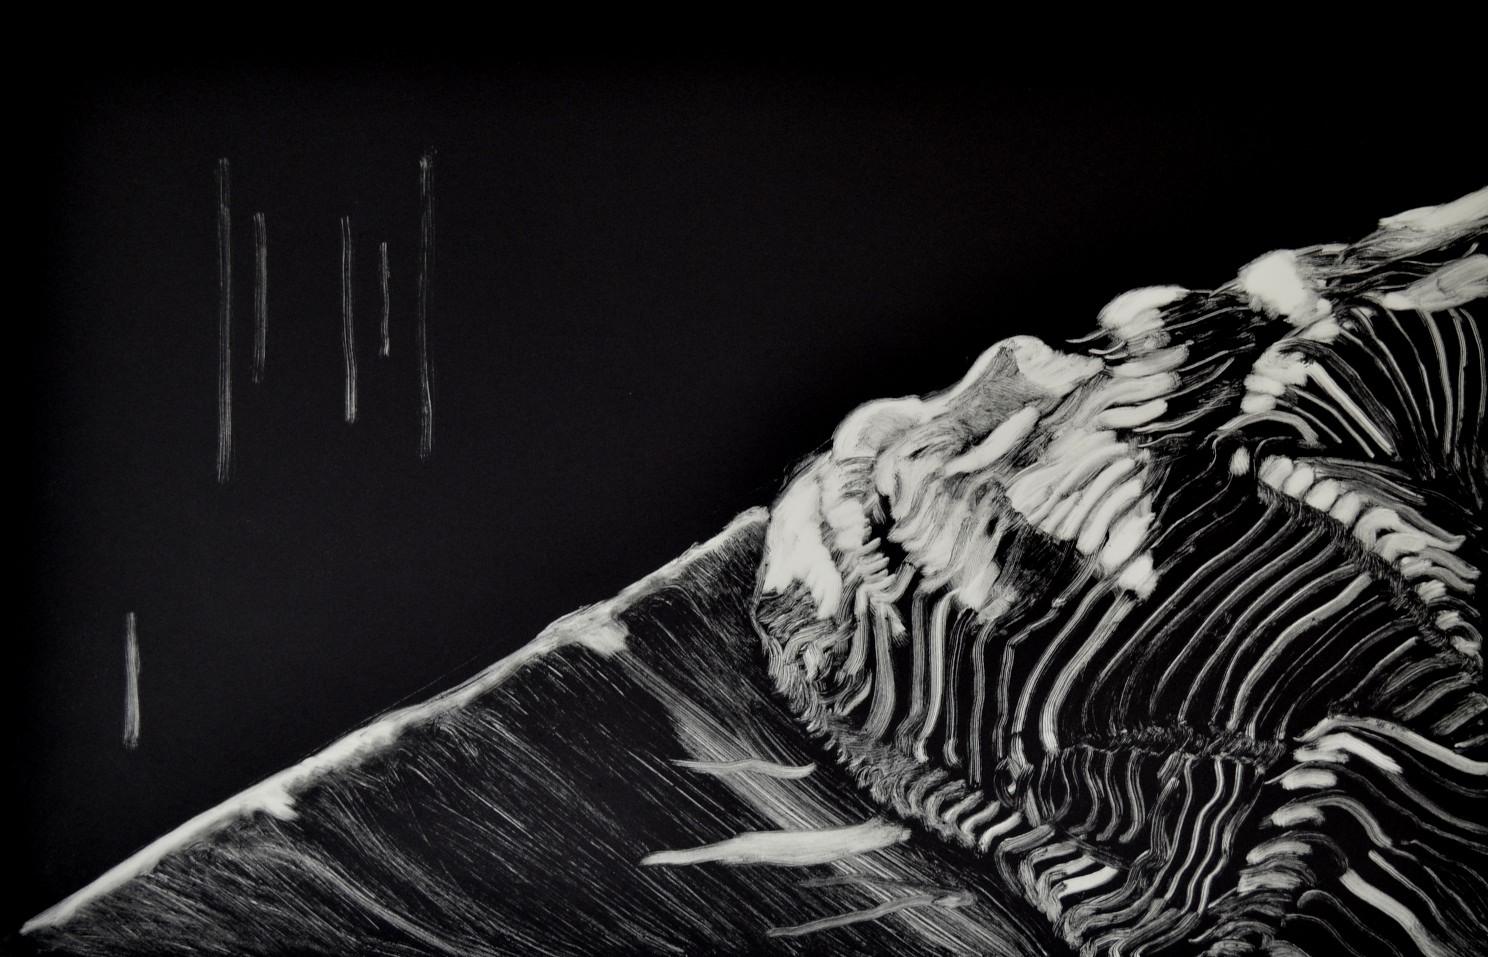 Into the Night (VIII)